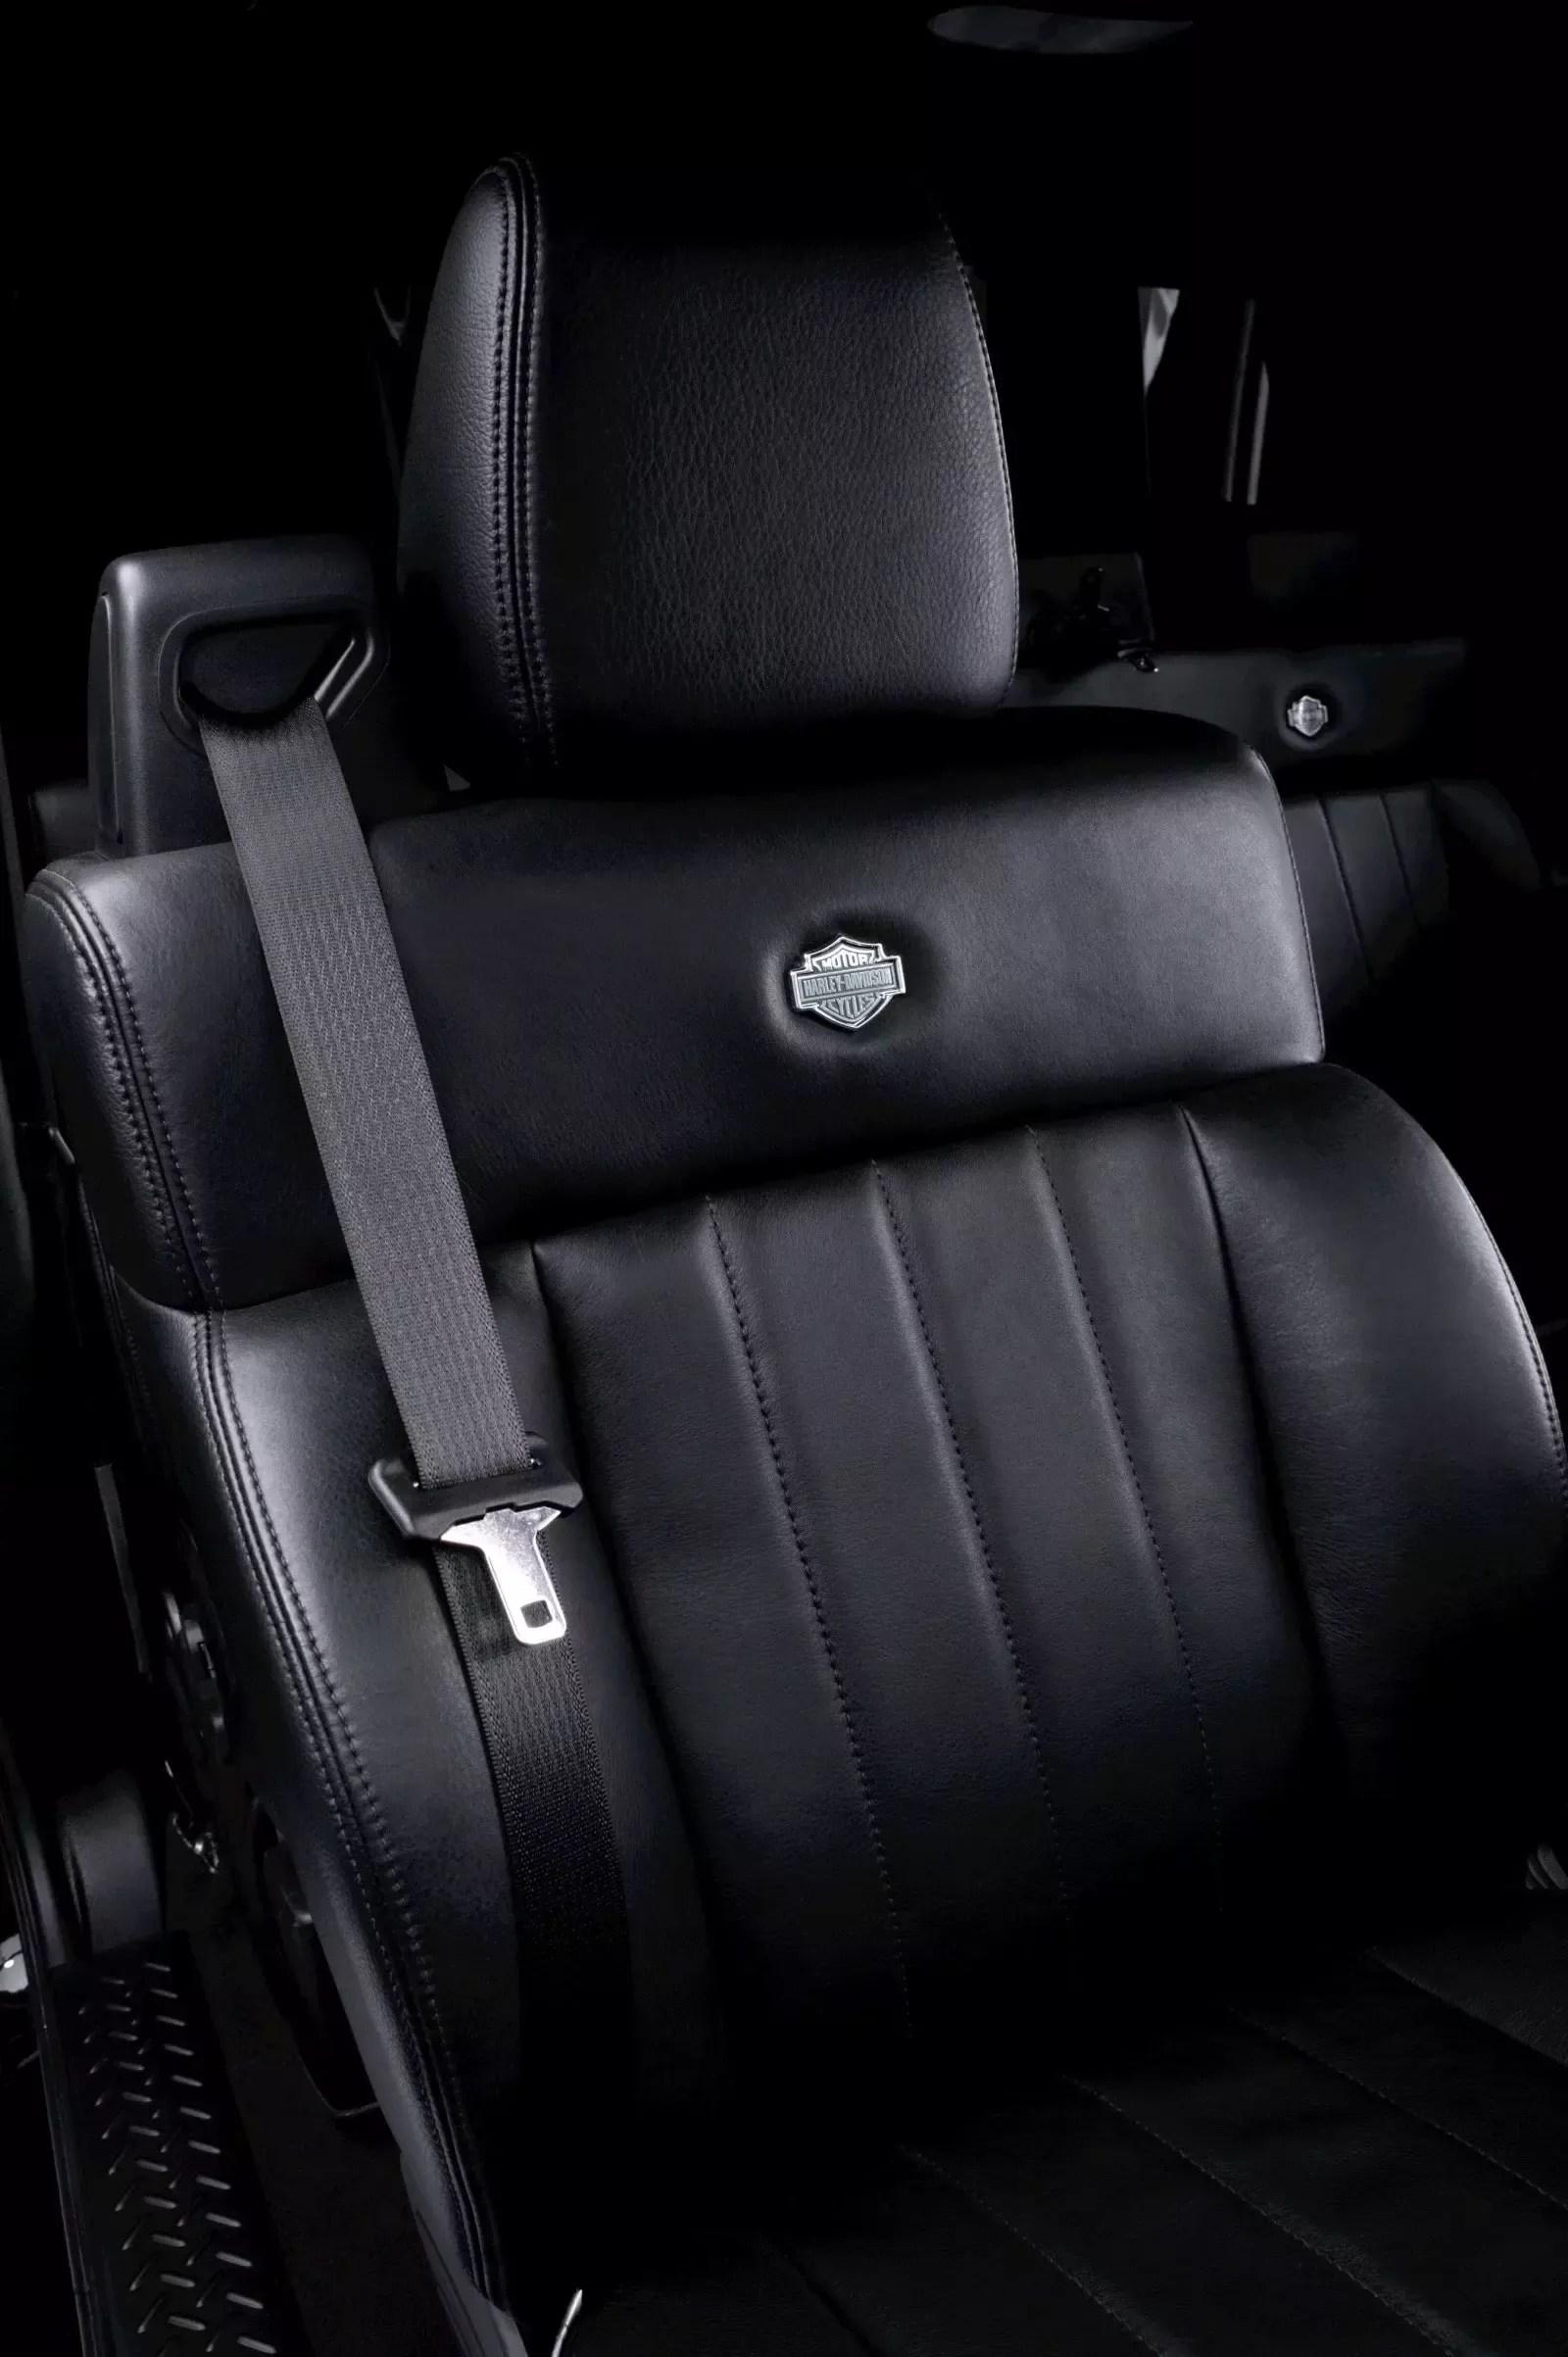 Harley Davidson F150 Interior : harley, davidson, interior, Harley-Davidson, F-150, Super, Speed